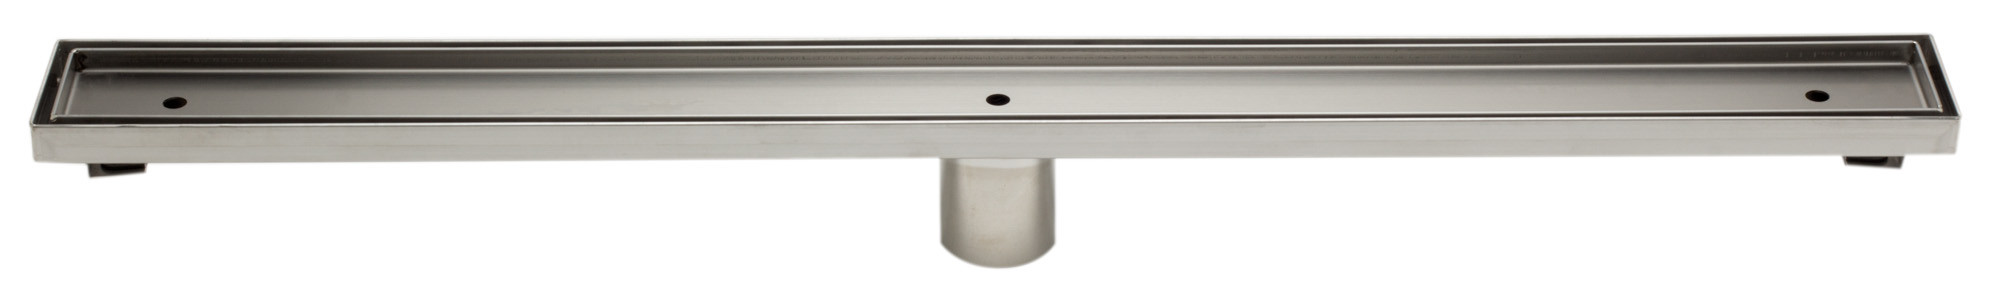 "ALFI brand ABLD32A 32"" Modern Stainless Steel Linear Shower Drain  w/o Cover"